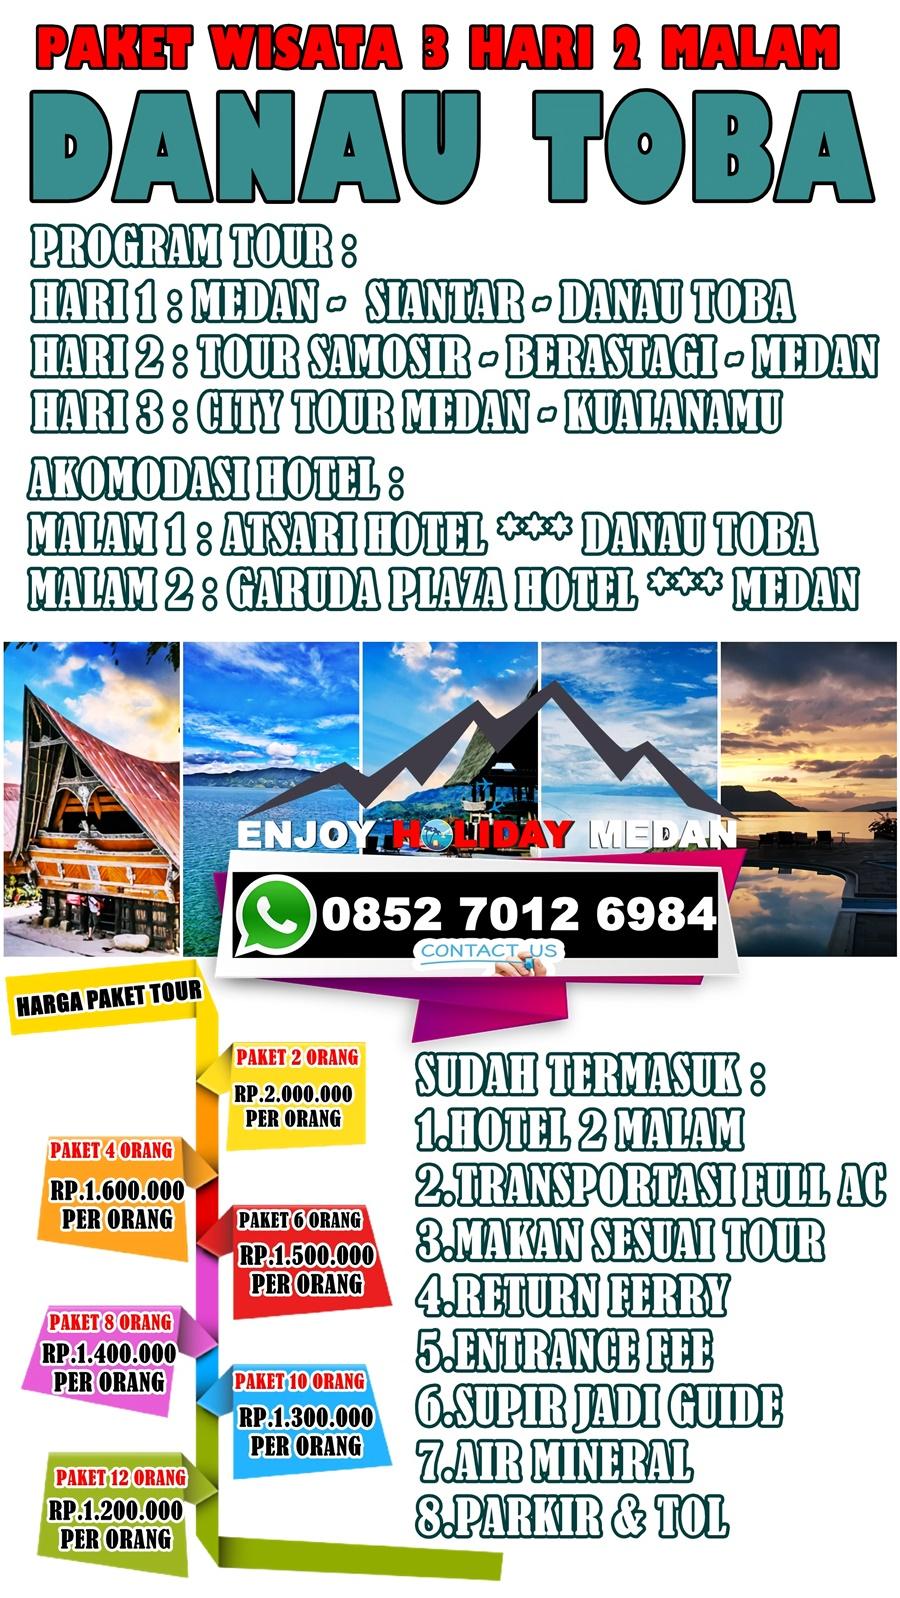 Backpacker Ke Medan Danau Toba